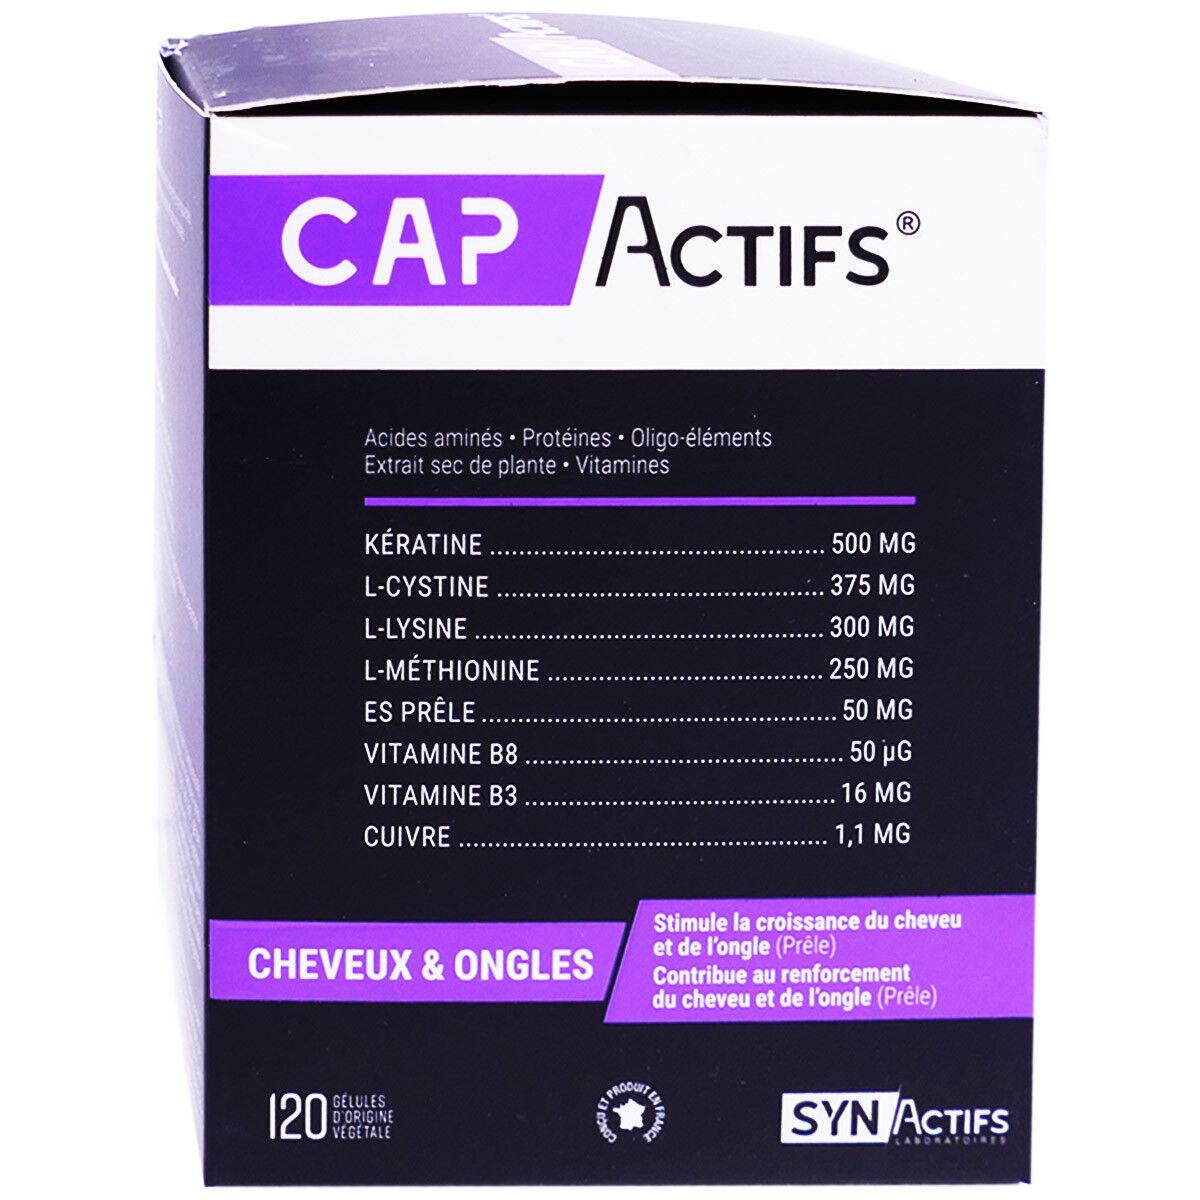 Syn actifs cap actifs cheveux & ongles 120 gelules